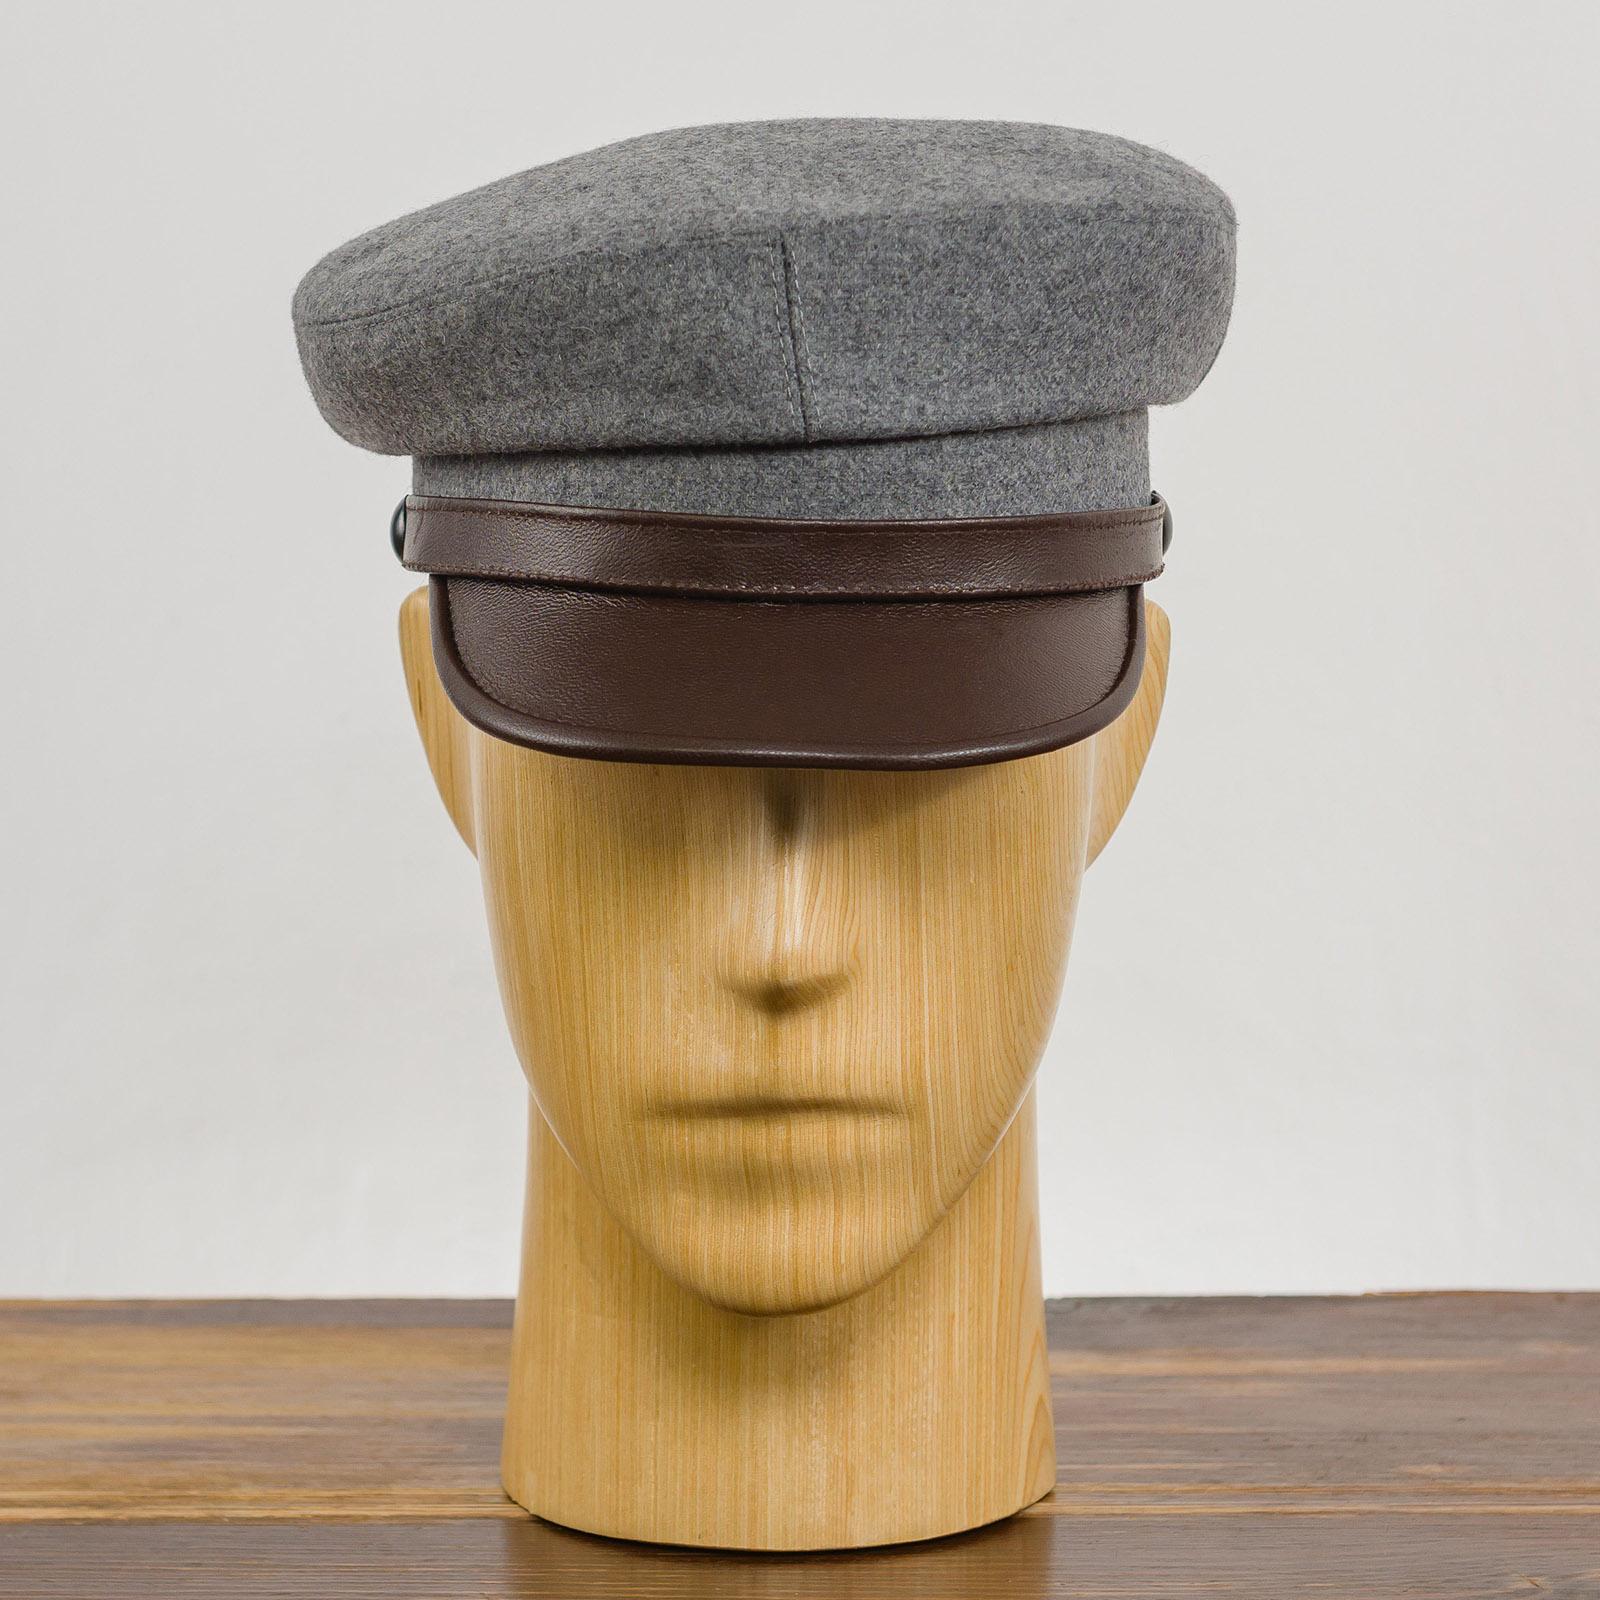 Maciejowka model 4 - Mütze mit schirm, kappe männer, trendige mützen